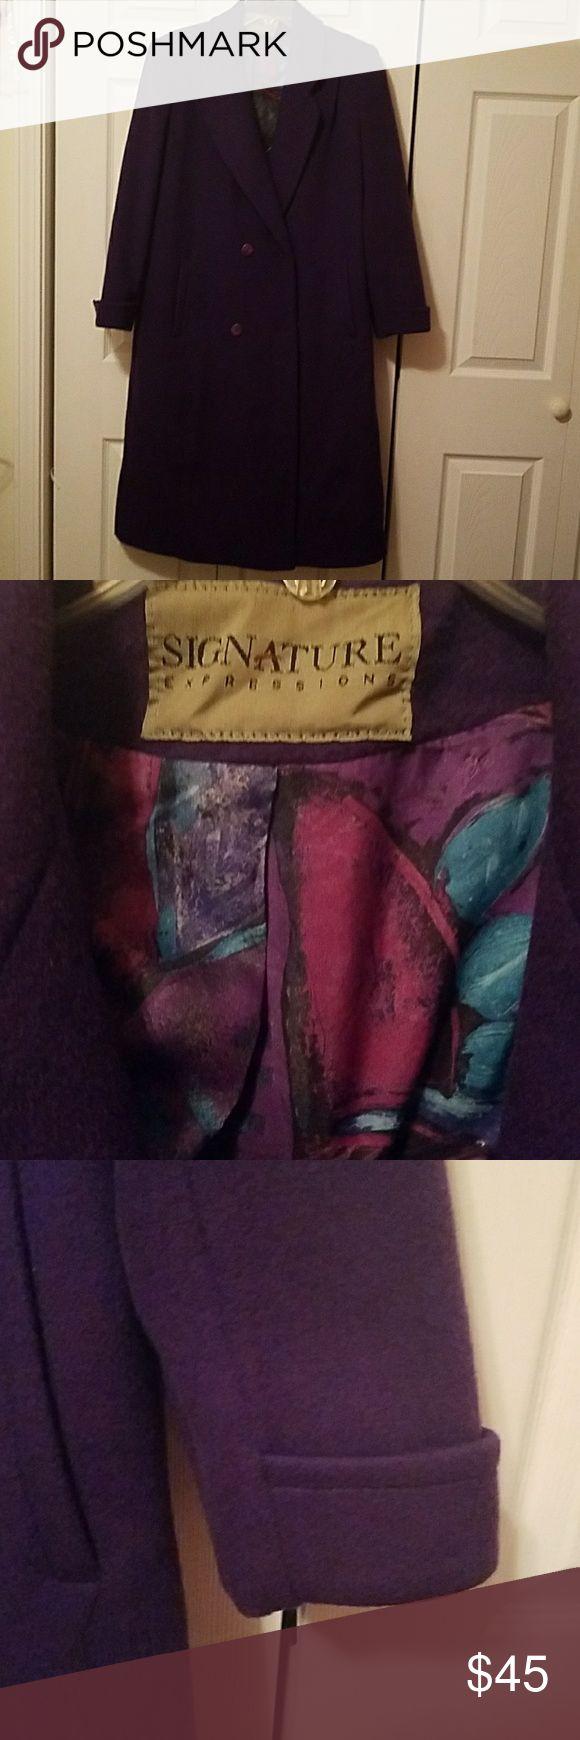 Signature  Expressions Ladies long Coat FULLY LINED, SIDE POCKET, POCKETS INSIDE COAT. signature Jackets & Coats